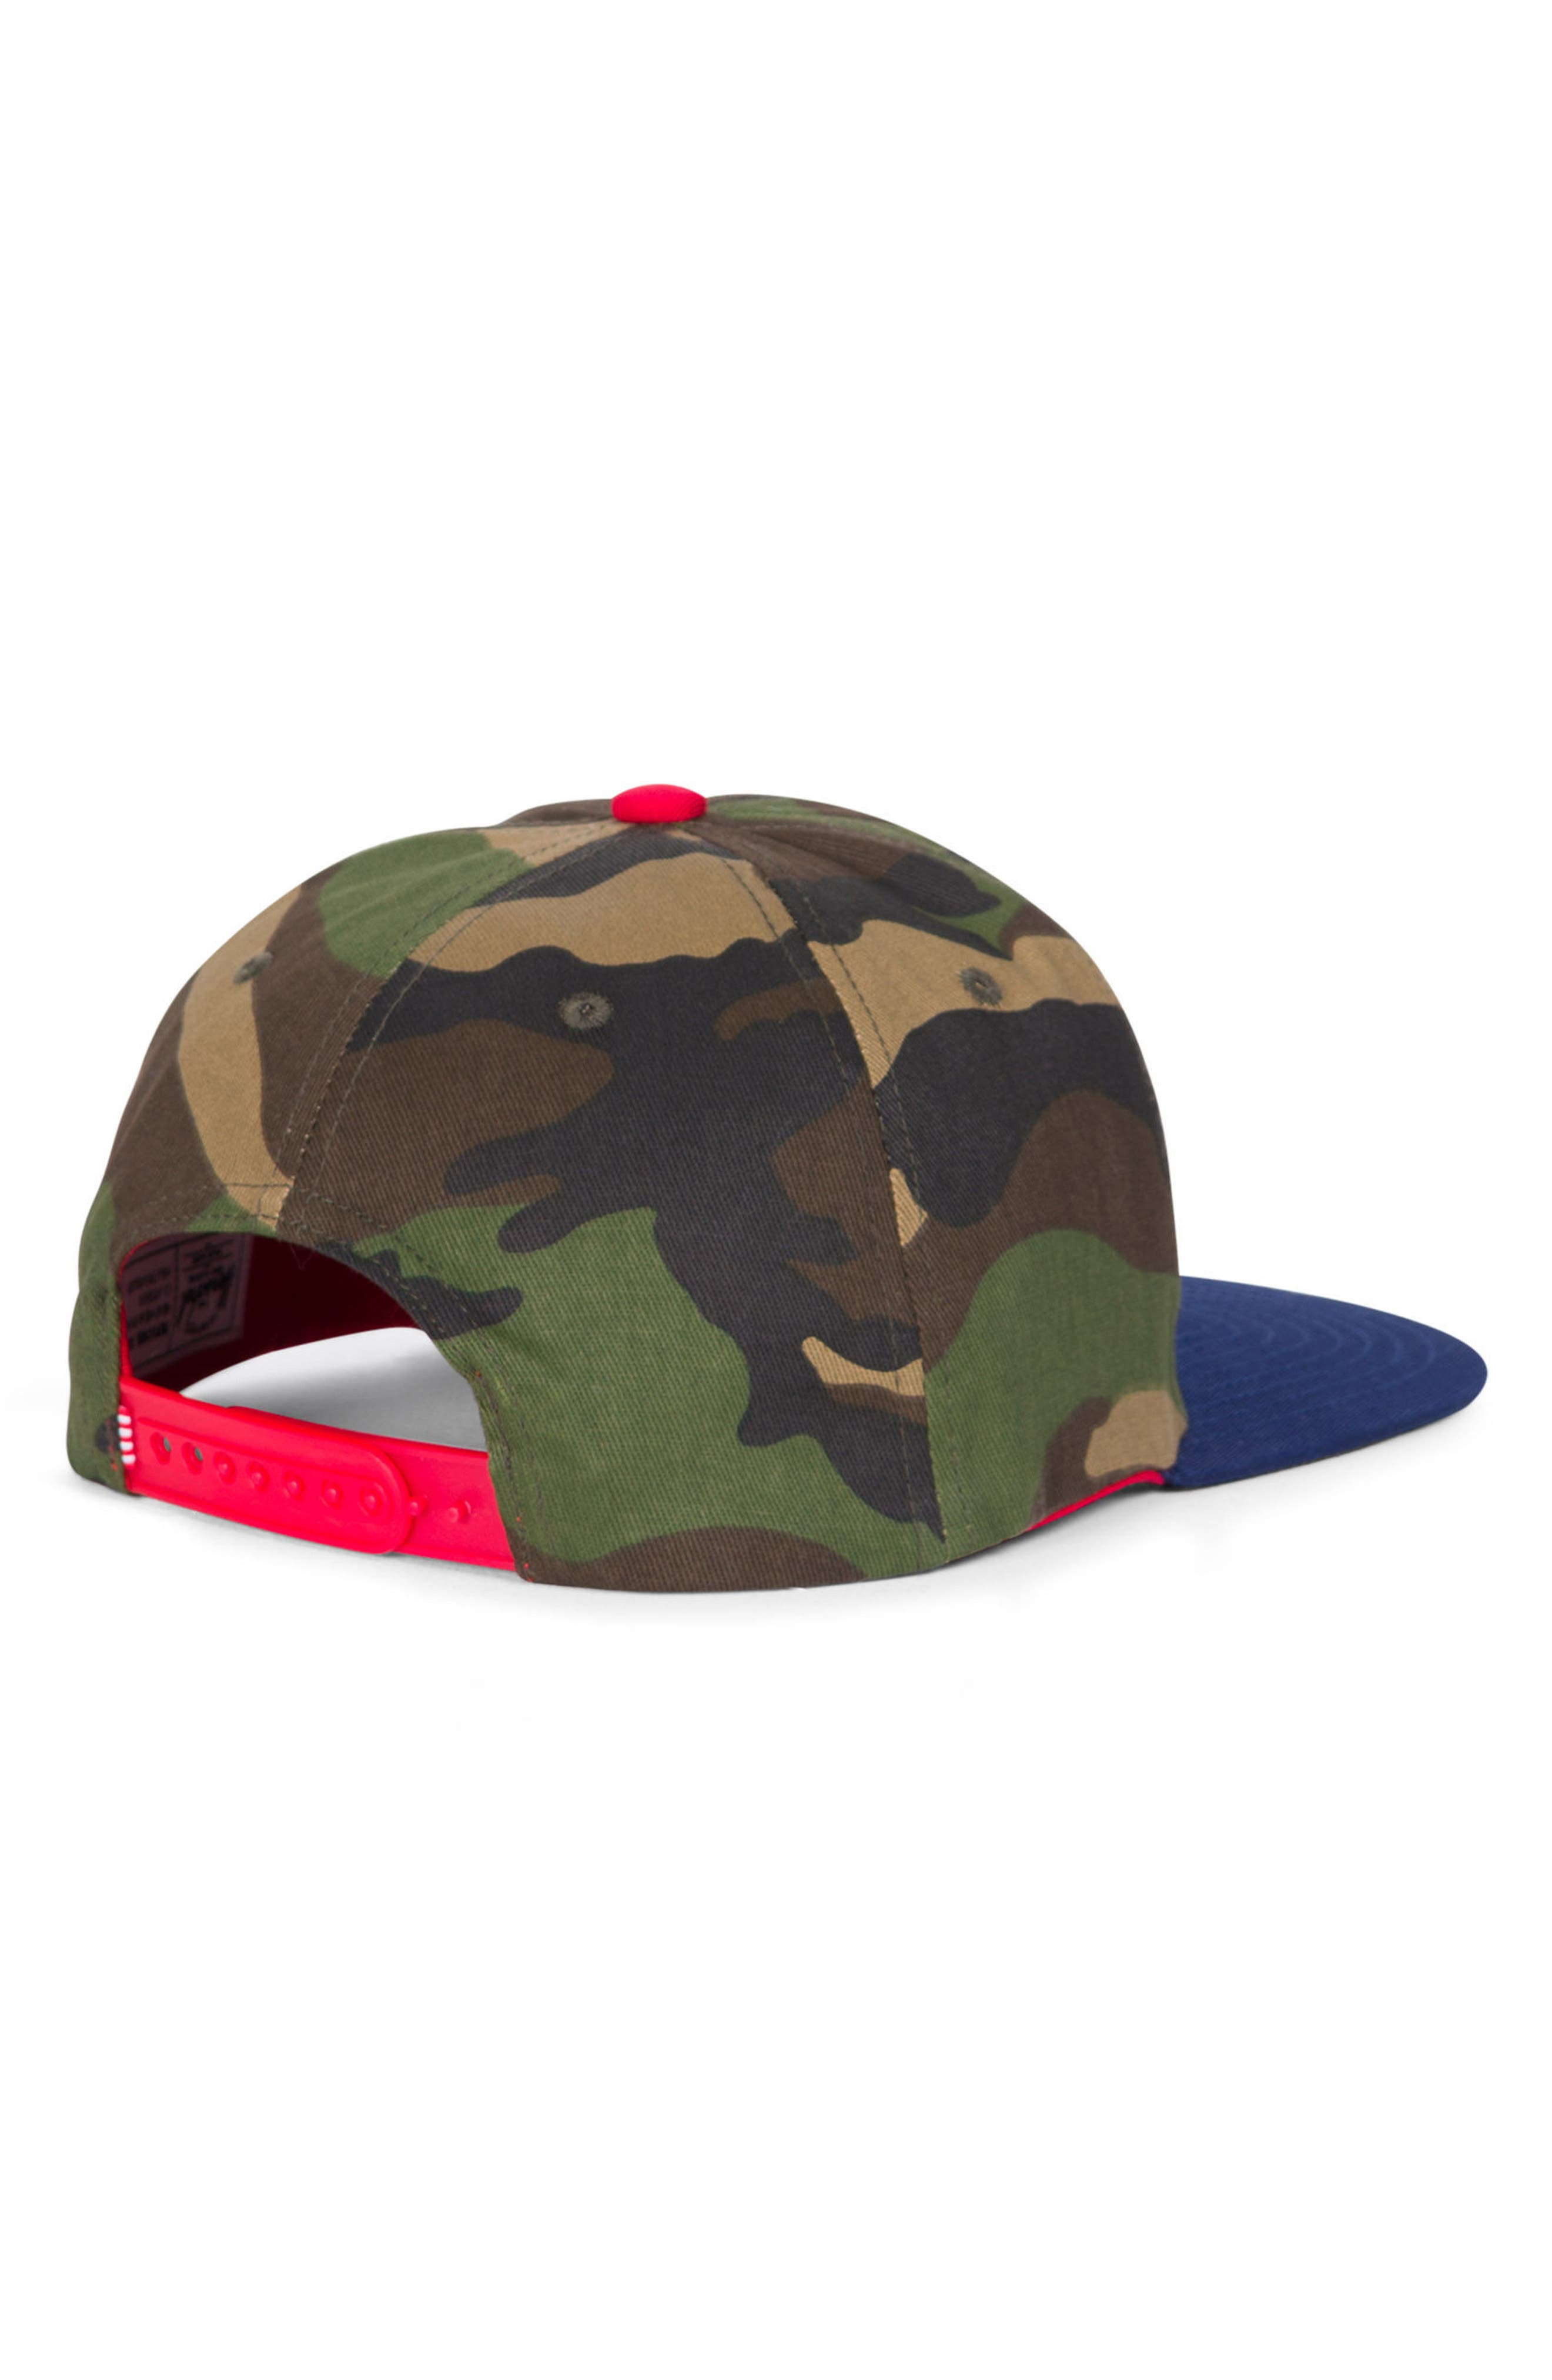 Mosby Camo Snapback Baseball Cap,                             Alternate thumbnail 2, color,                             Woodland Camo/ Navy/ Red